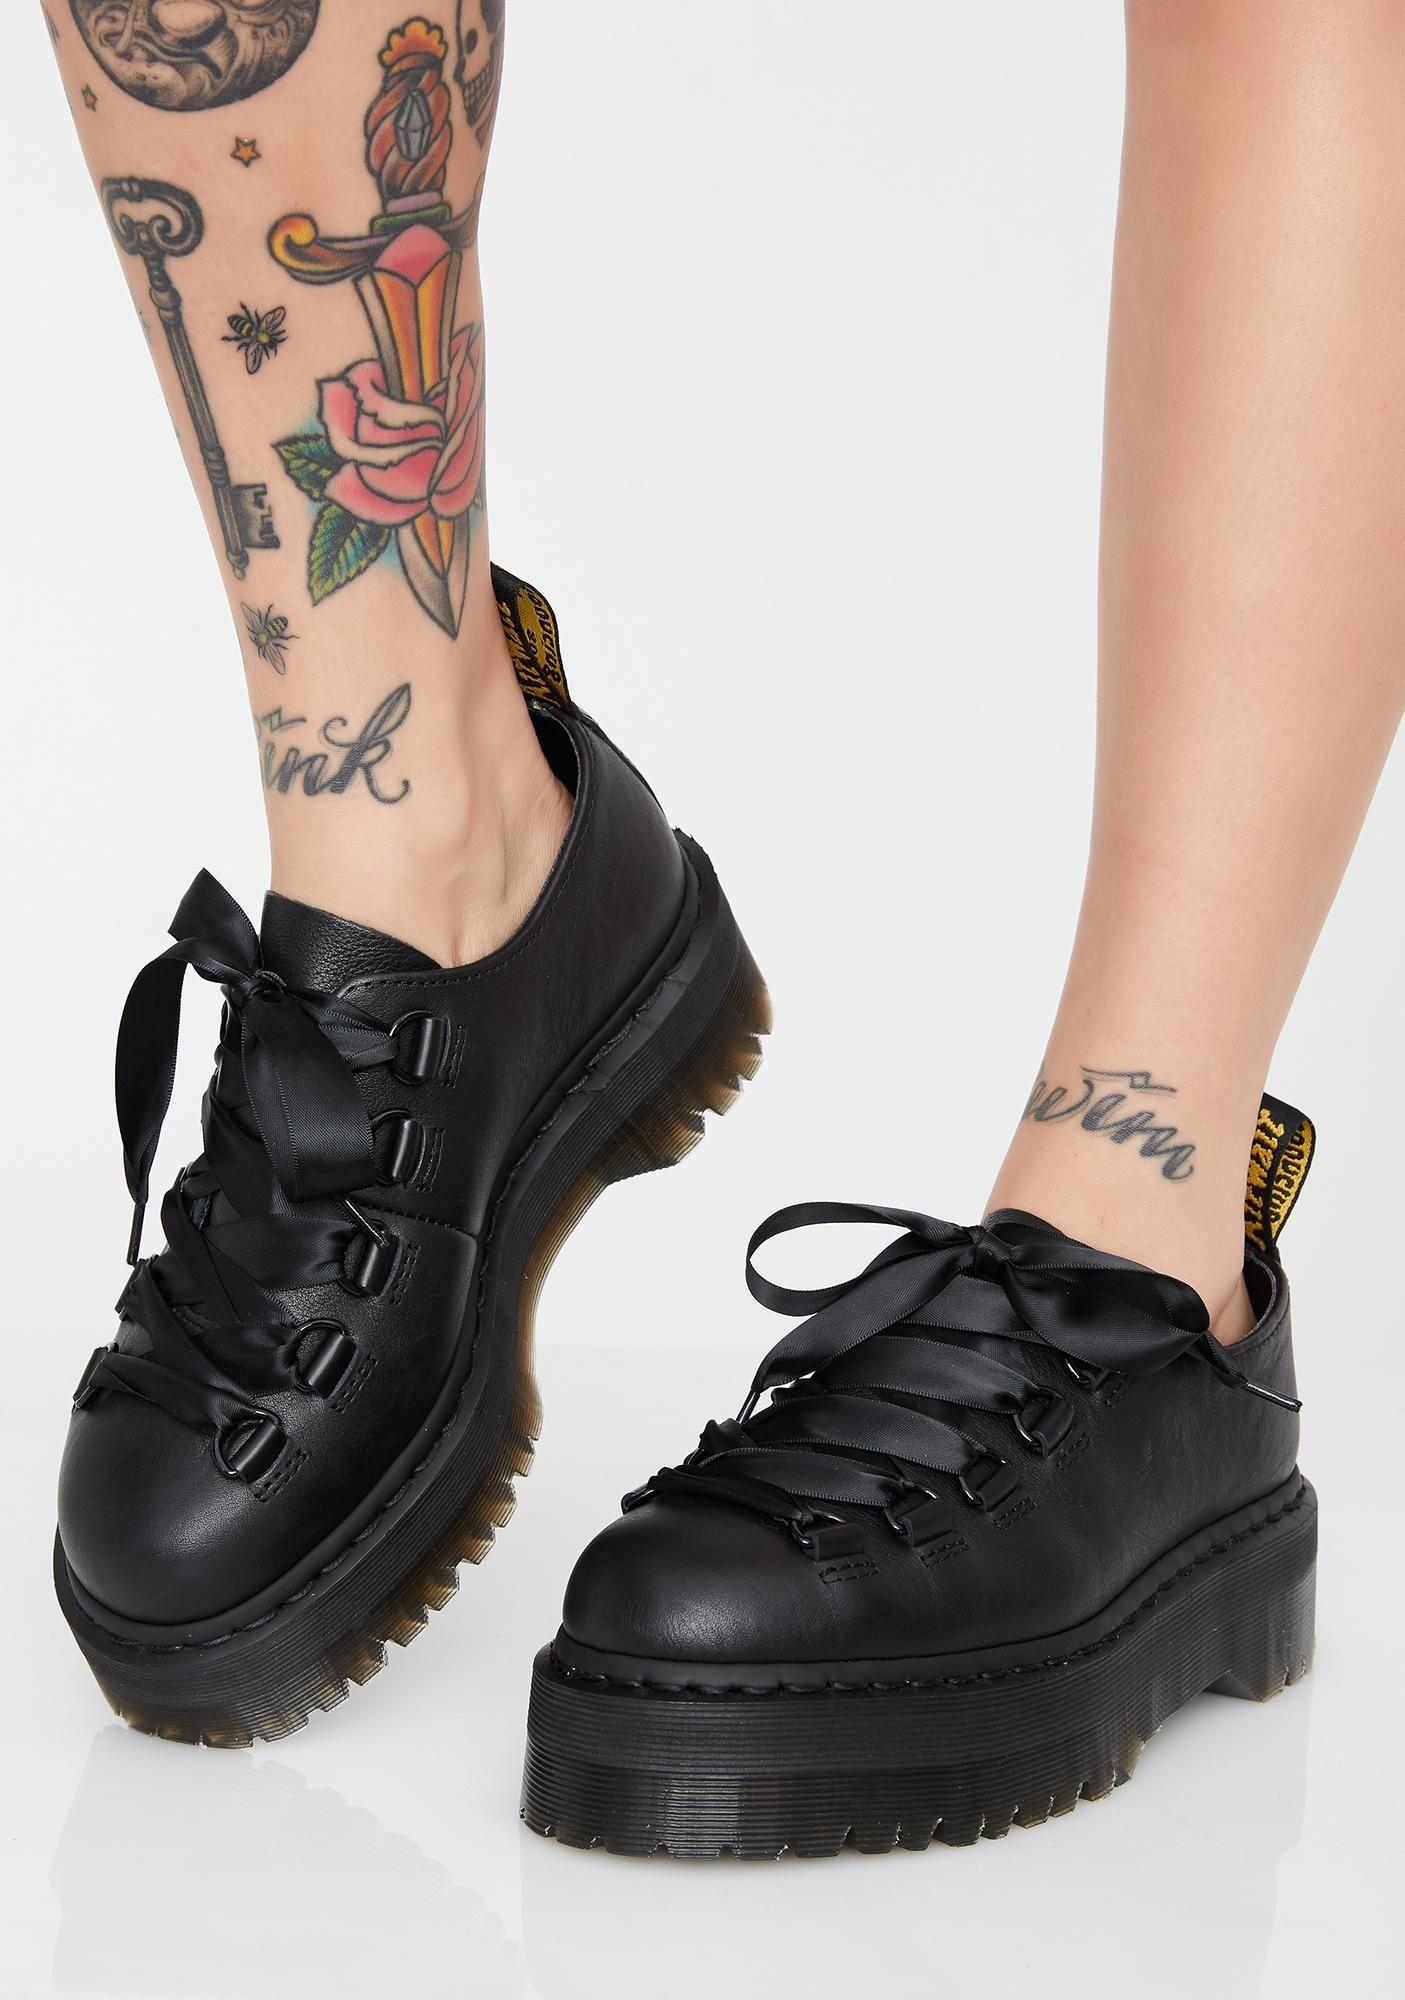 platform creepers Demonia shoes womens platforms black leather platform sneakers goth rock shoes womens size eu 37 us 6 uk 4 gothic wear